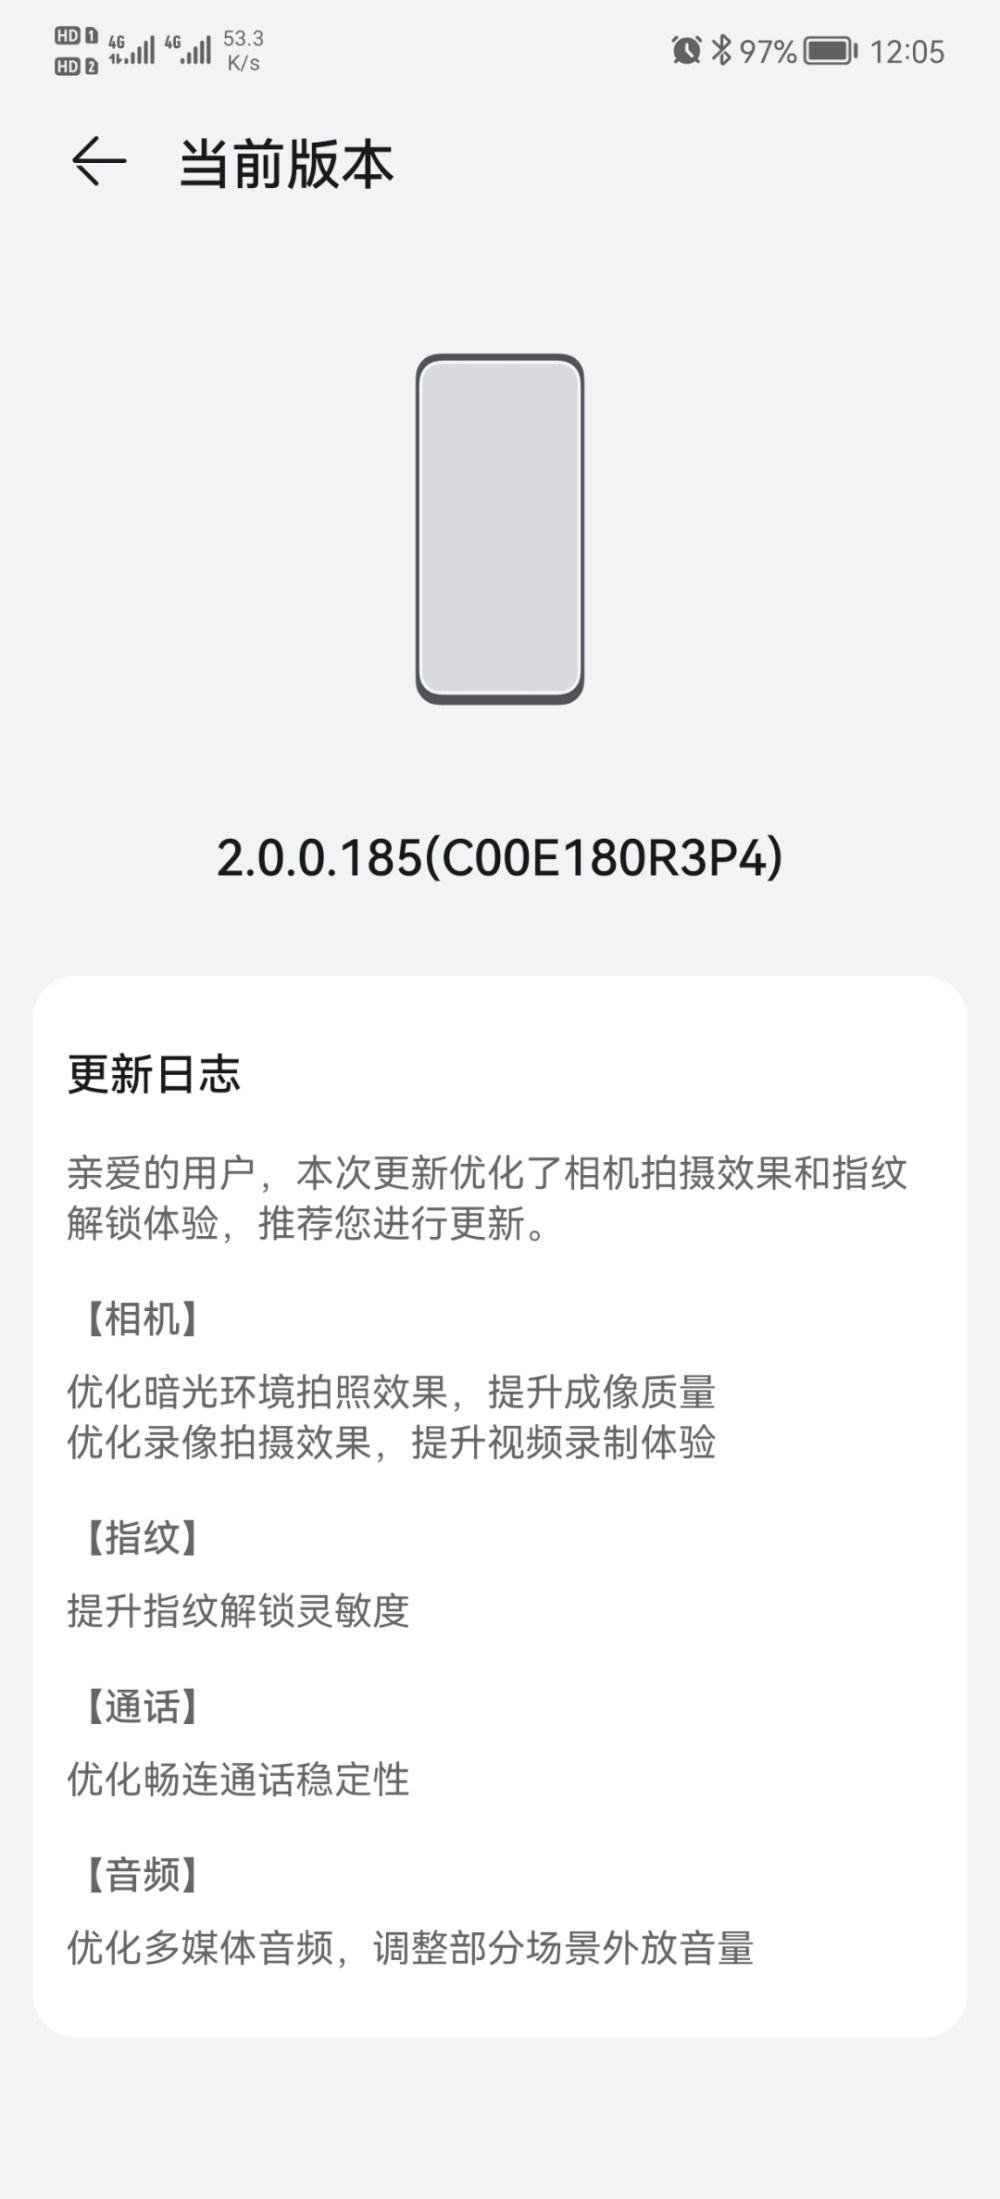 Huawei P50 Pro HarmonyOS 2.0.0.185 update